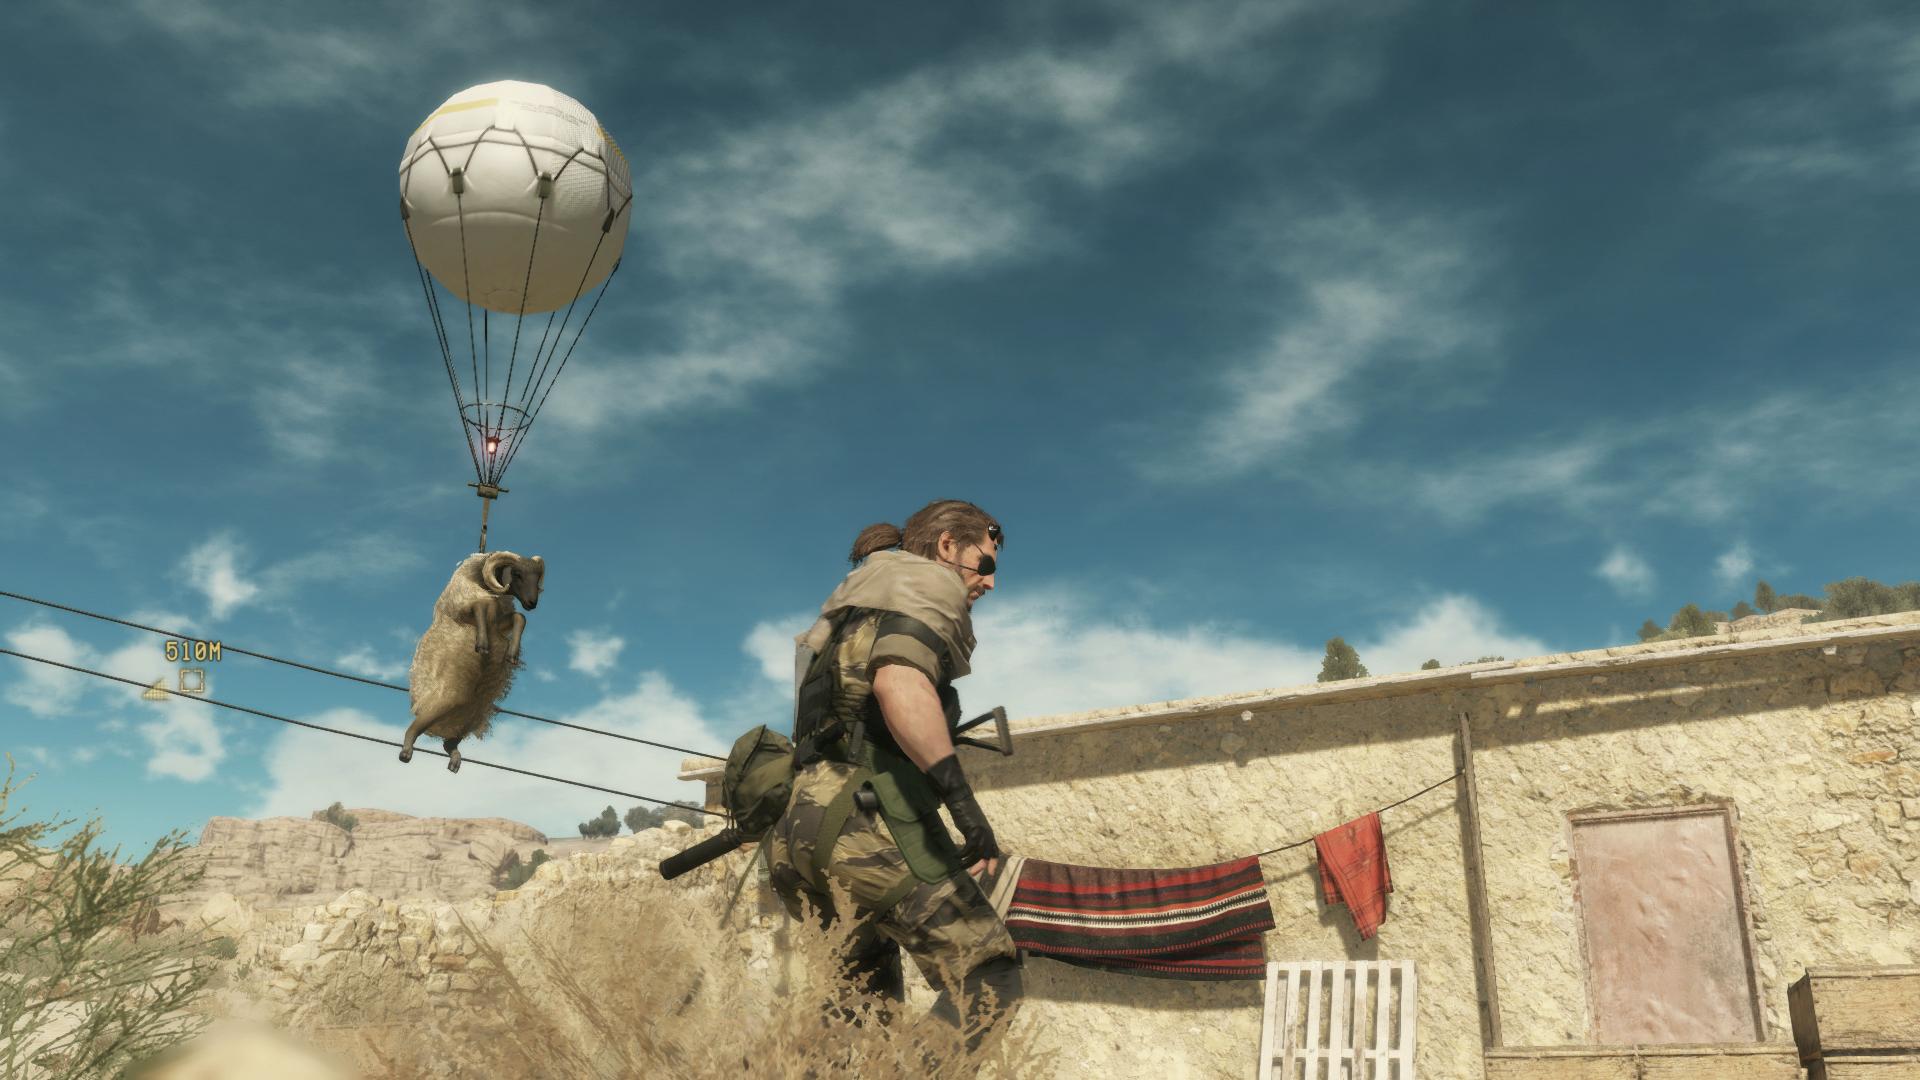 Metal Gear Solid V The Phantom Pain ESPAÑOL Descargar Full (CPY) + REPACK 5 DVD5 (JPW) 7